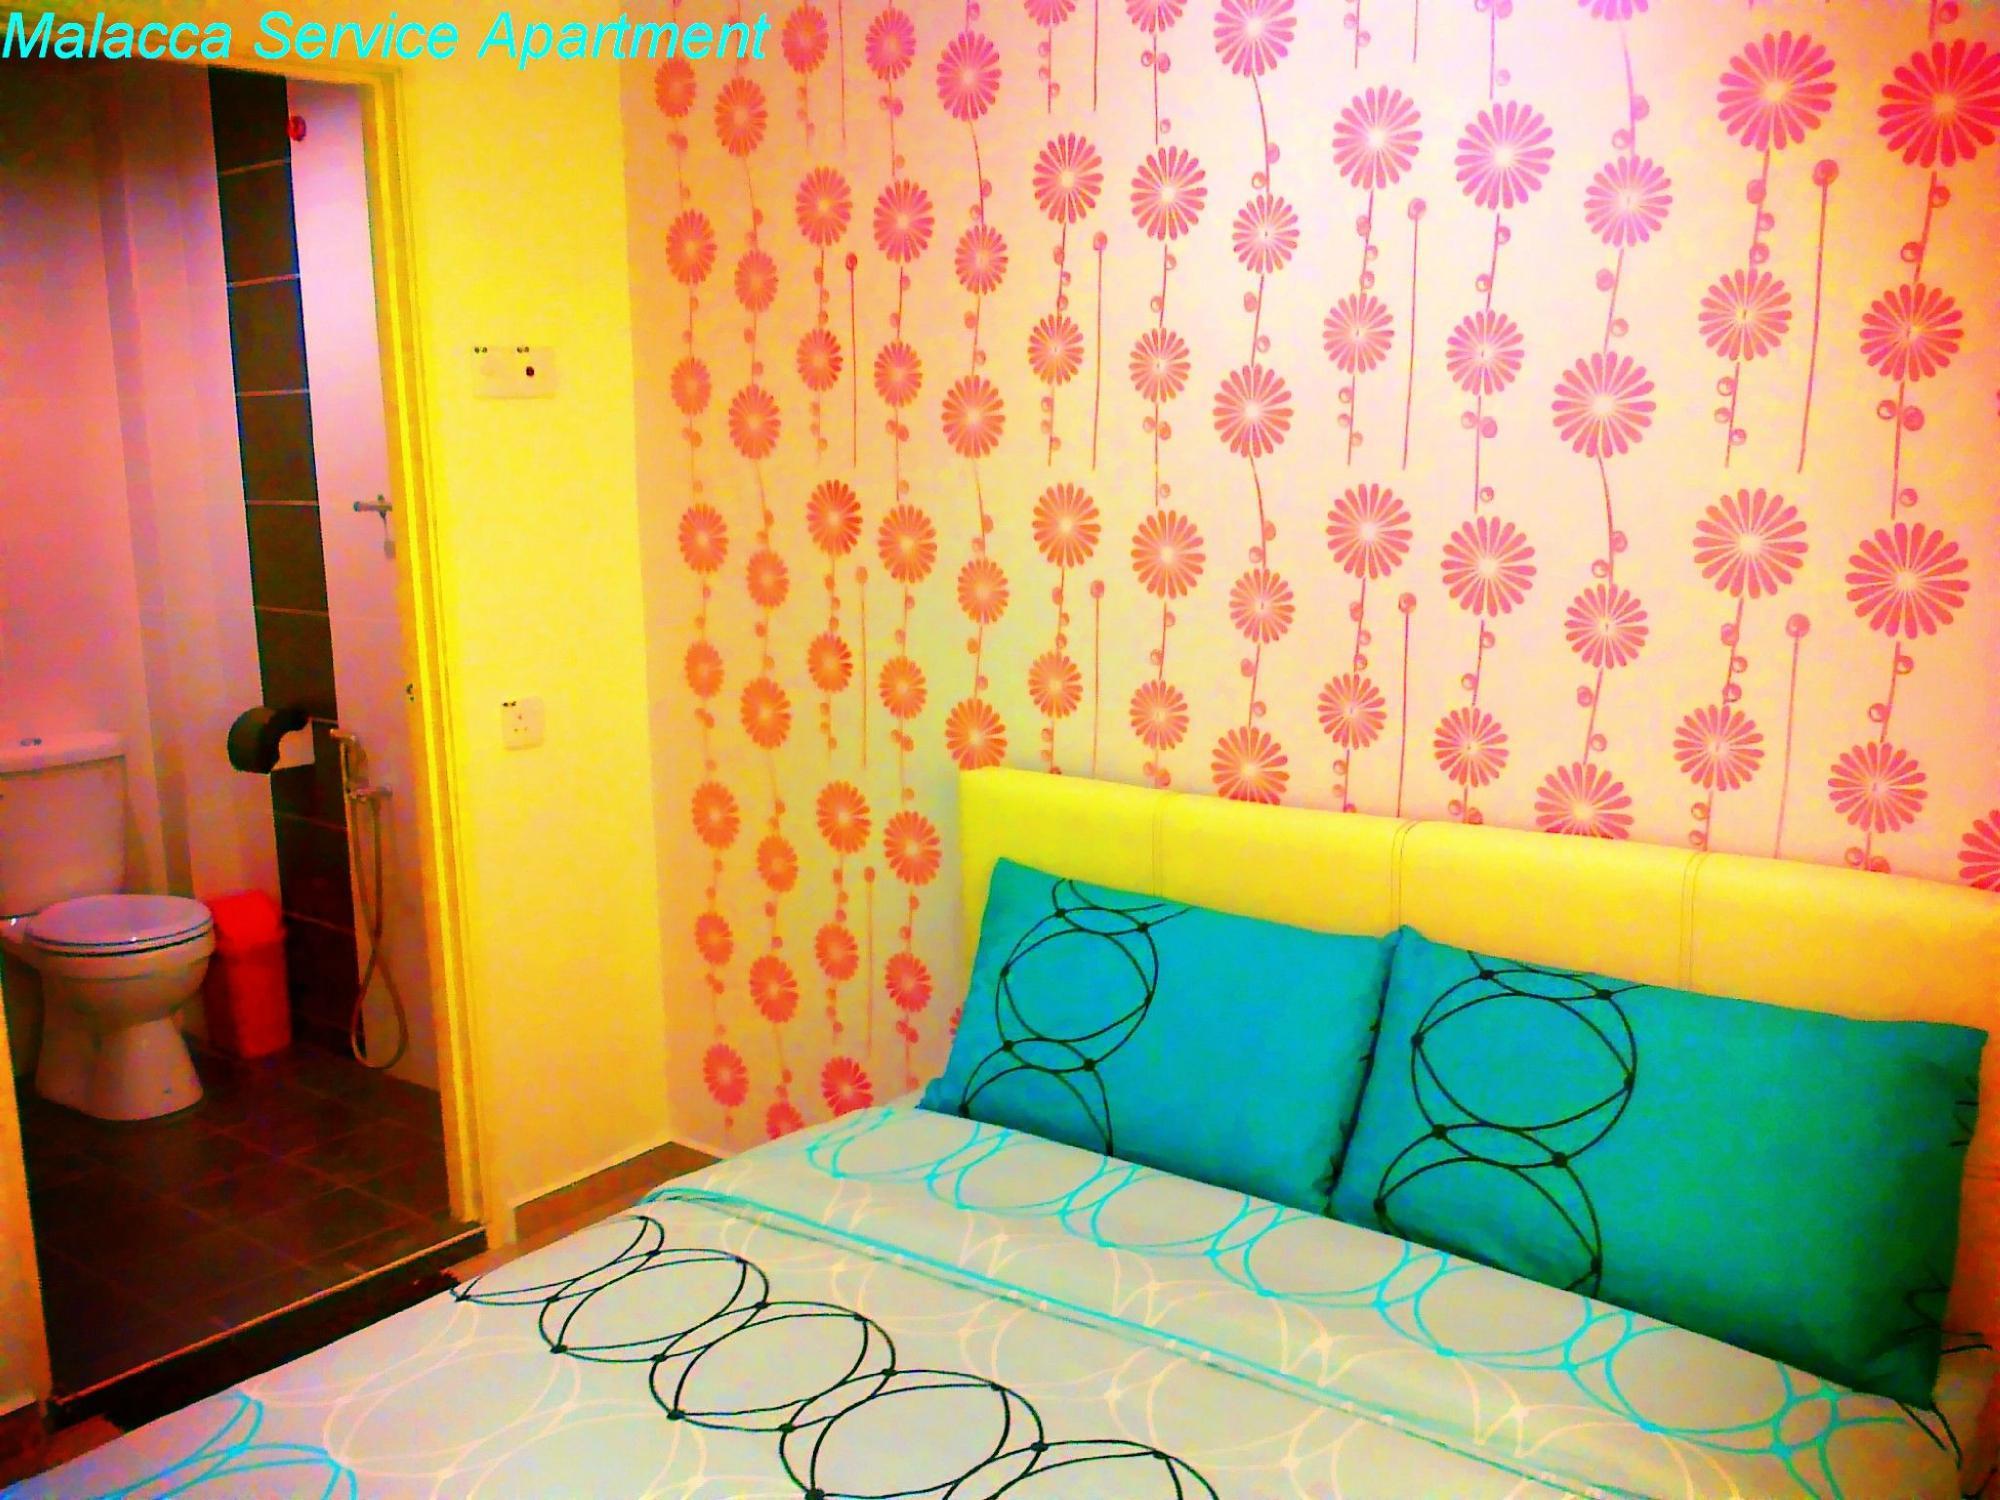 Malacca Service Apartment